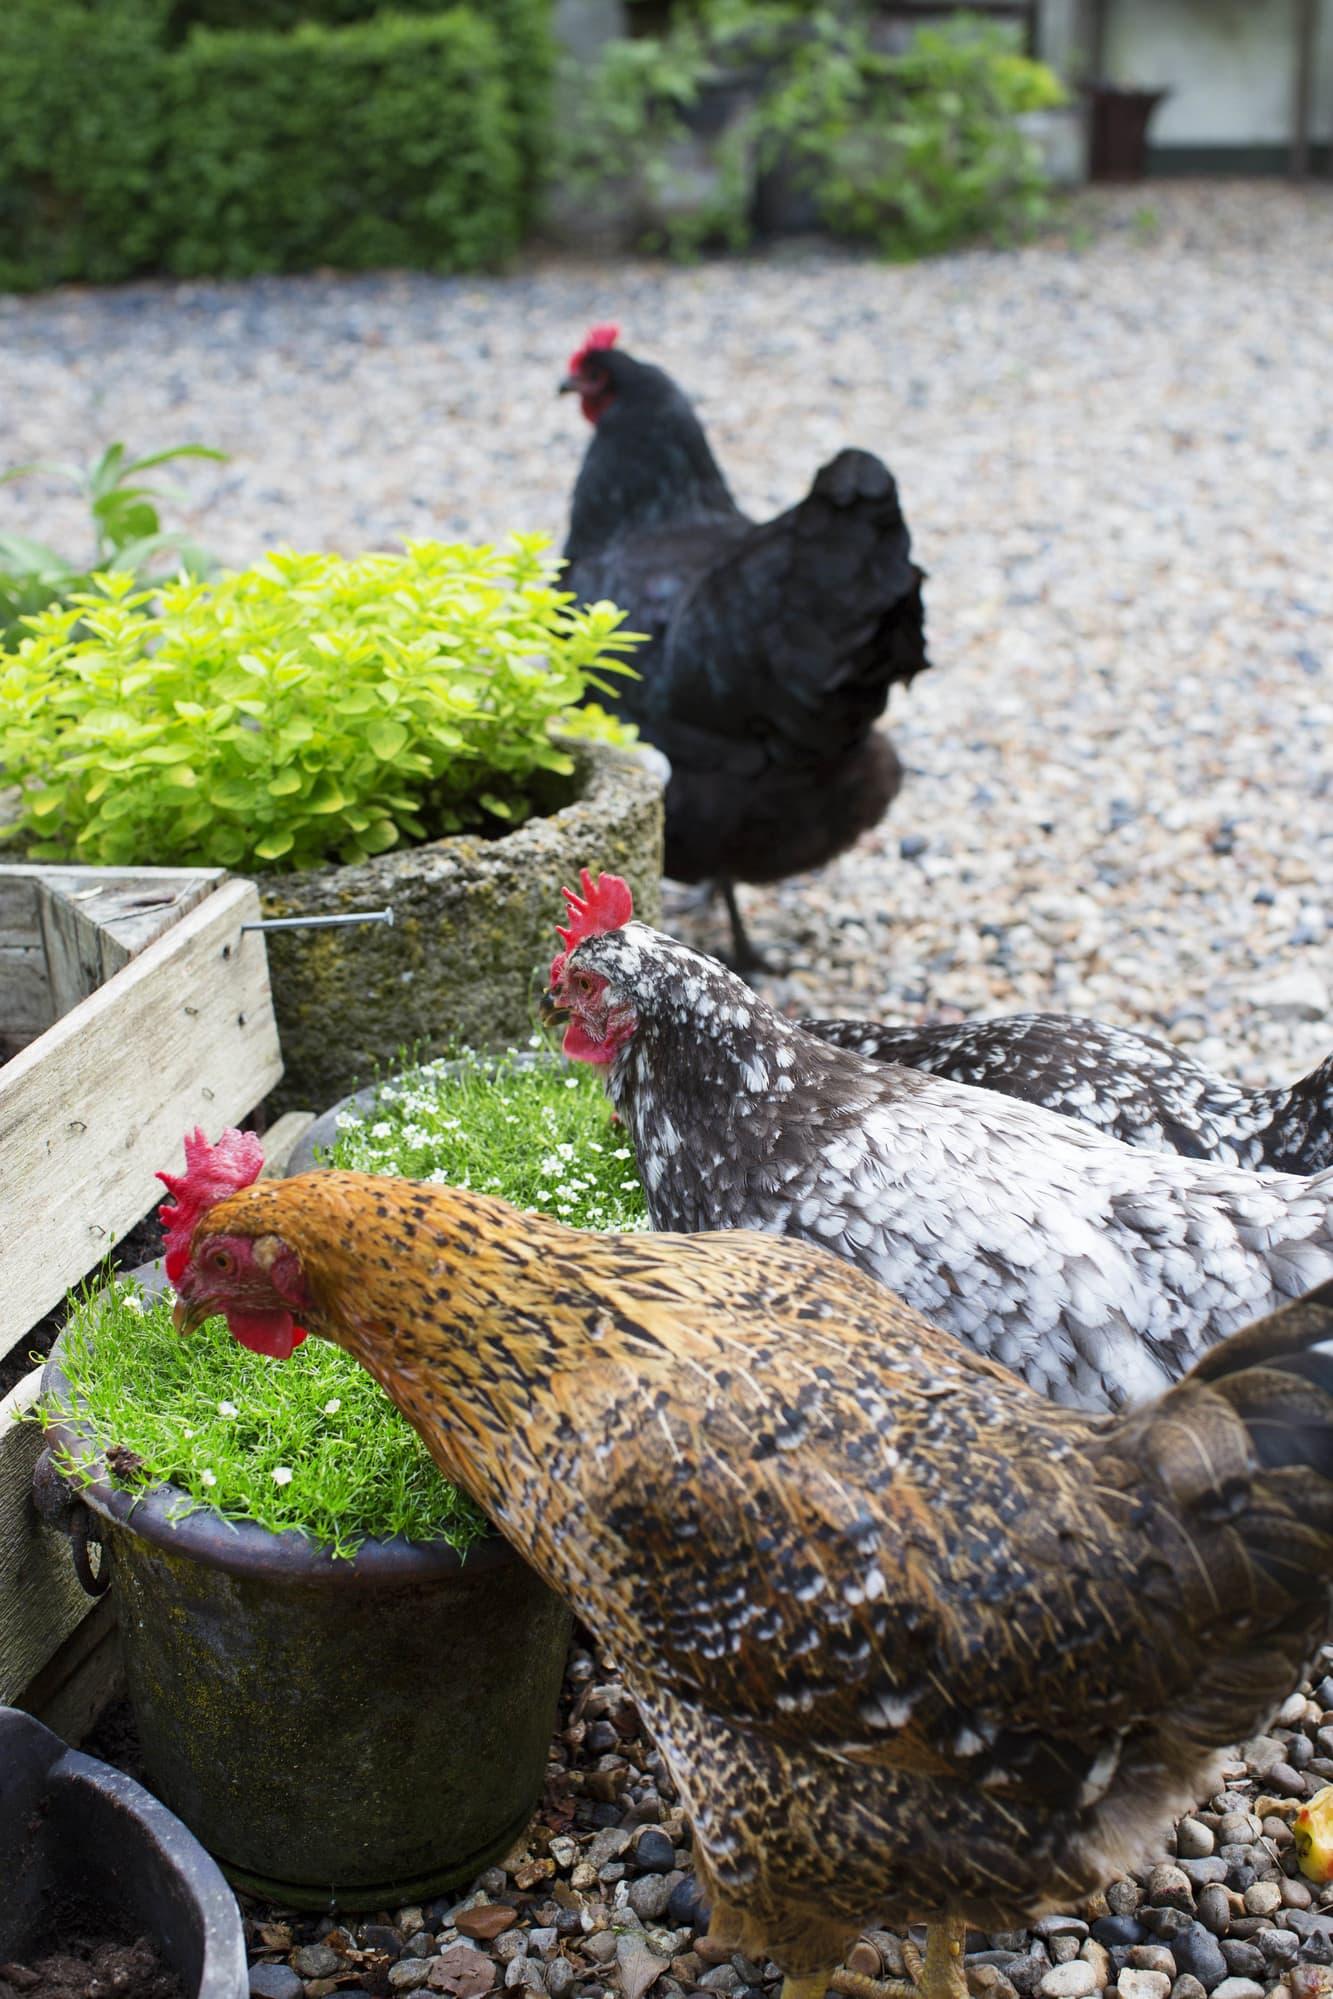 Orpington hens.